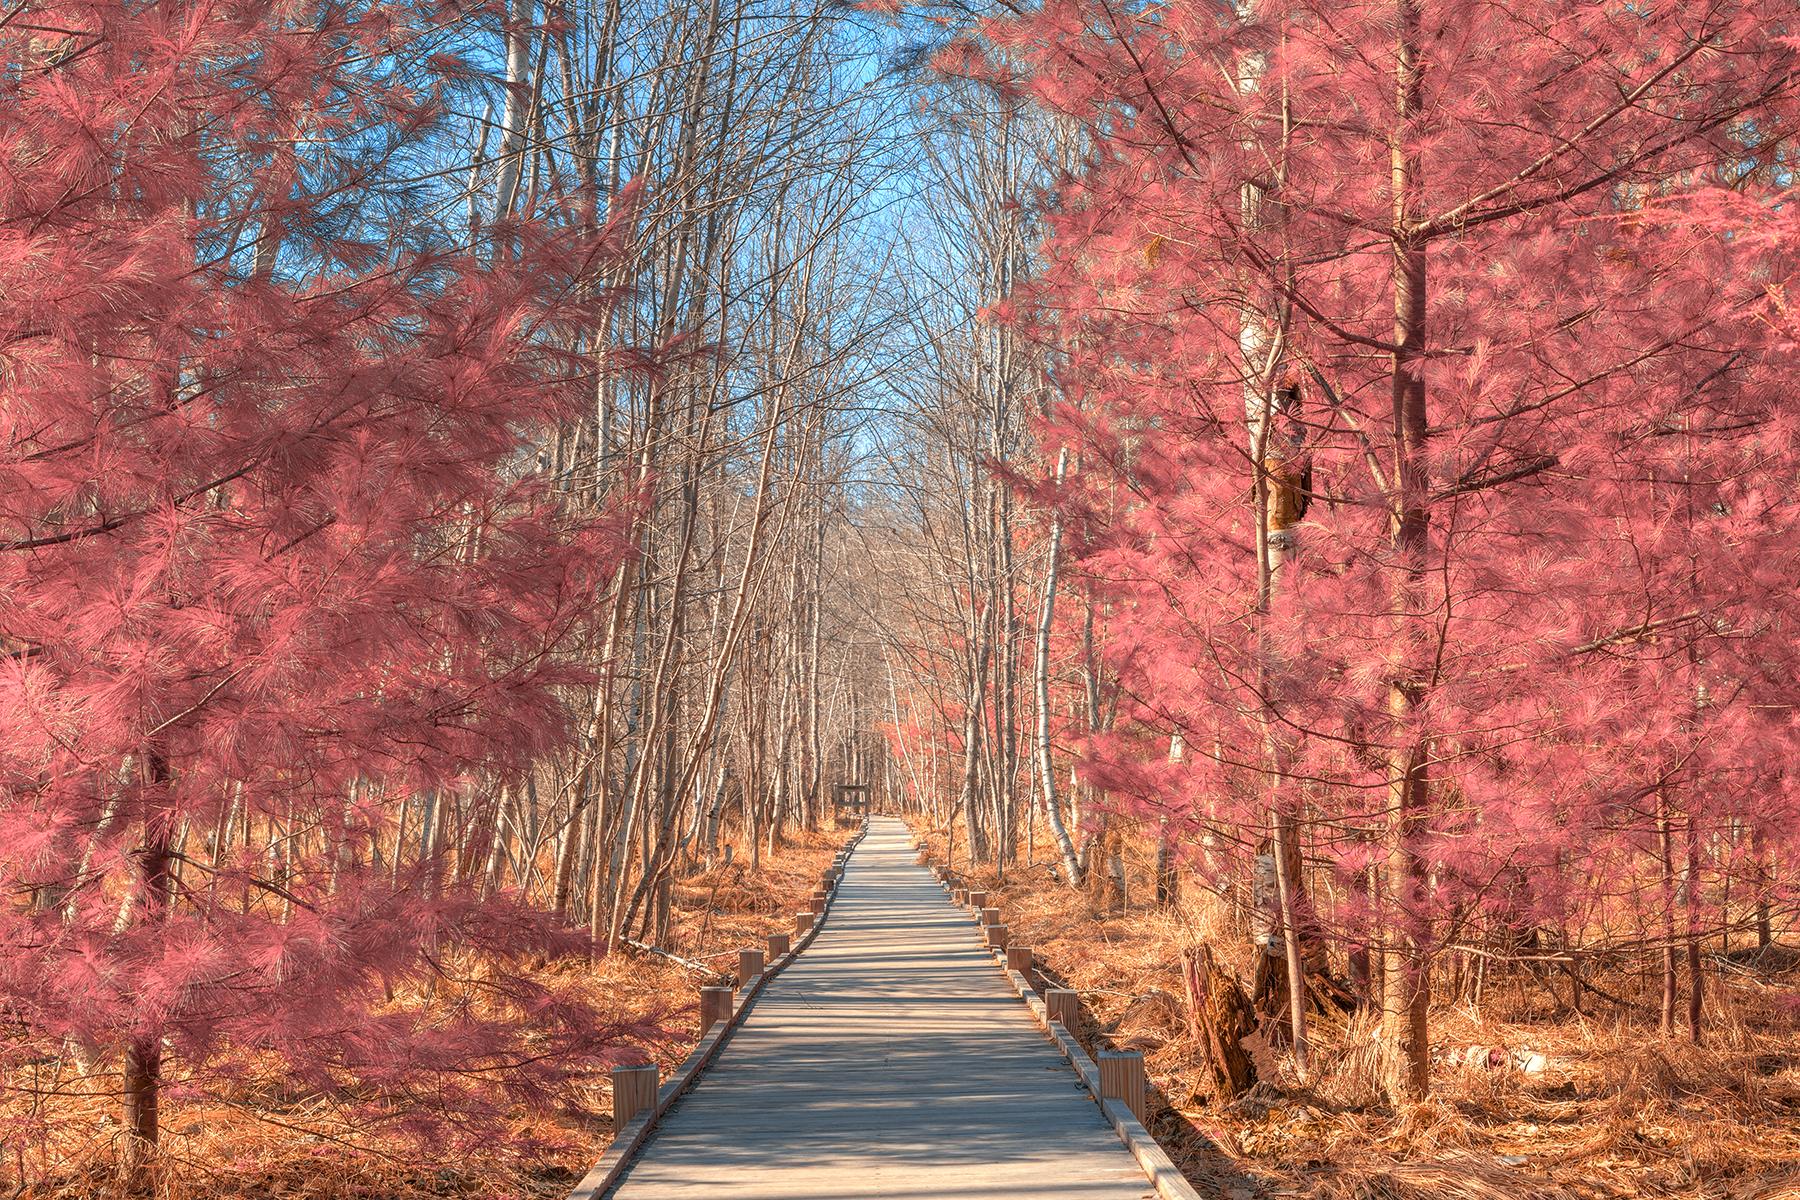 Jesup boardwalk trail - tickle me pink hdr photo